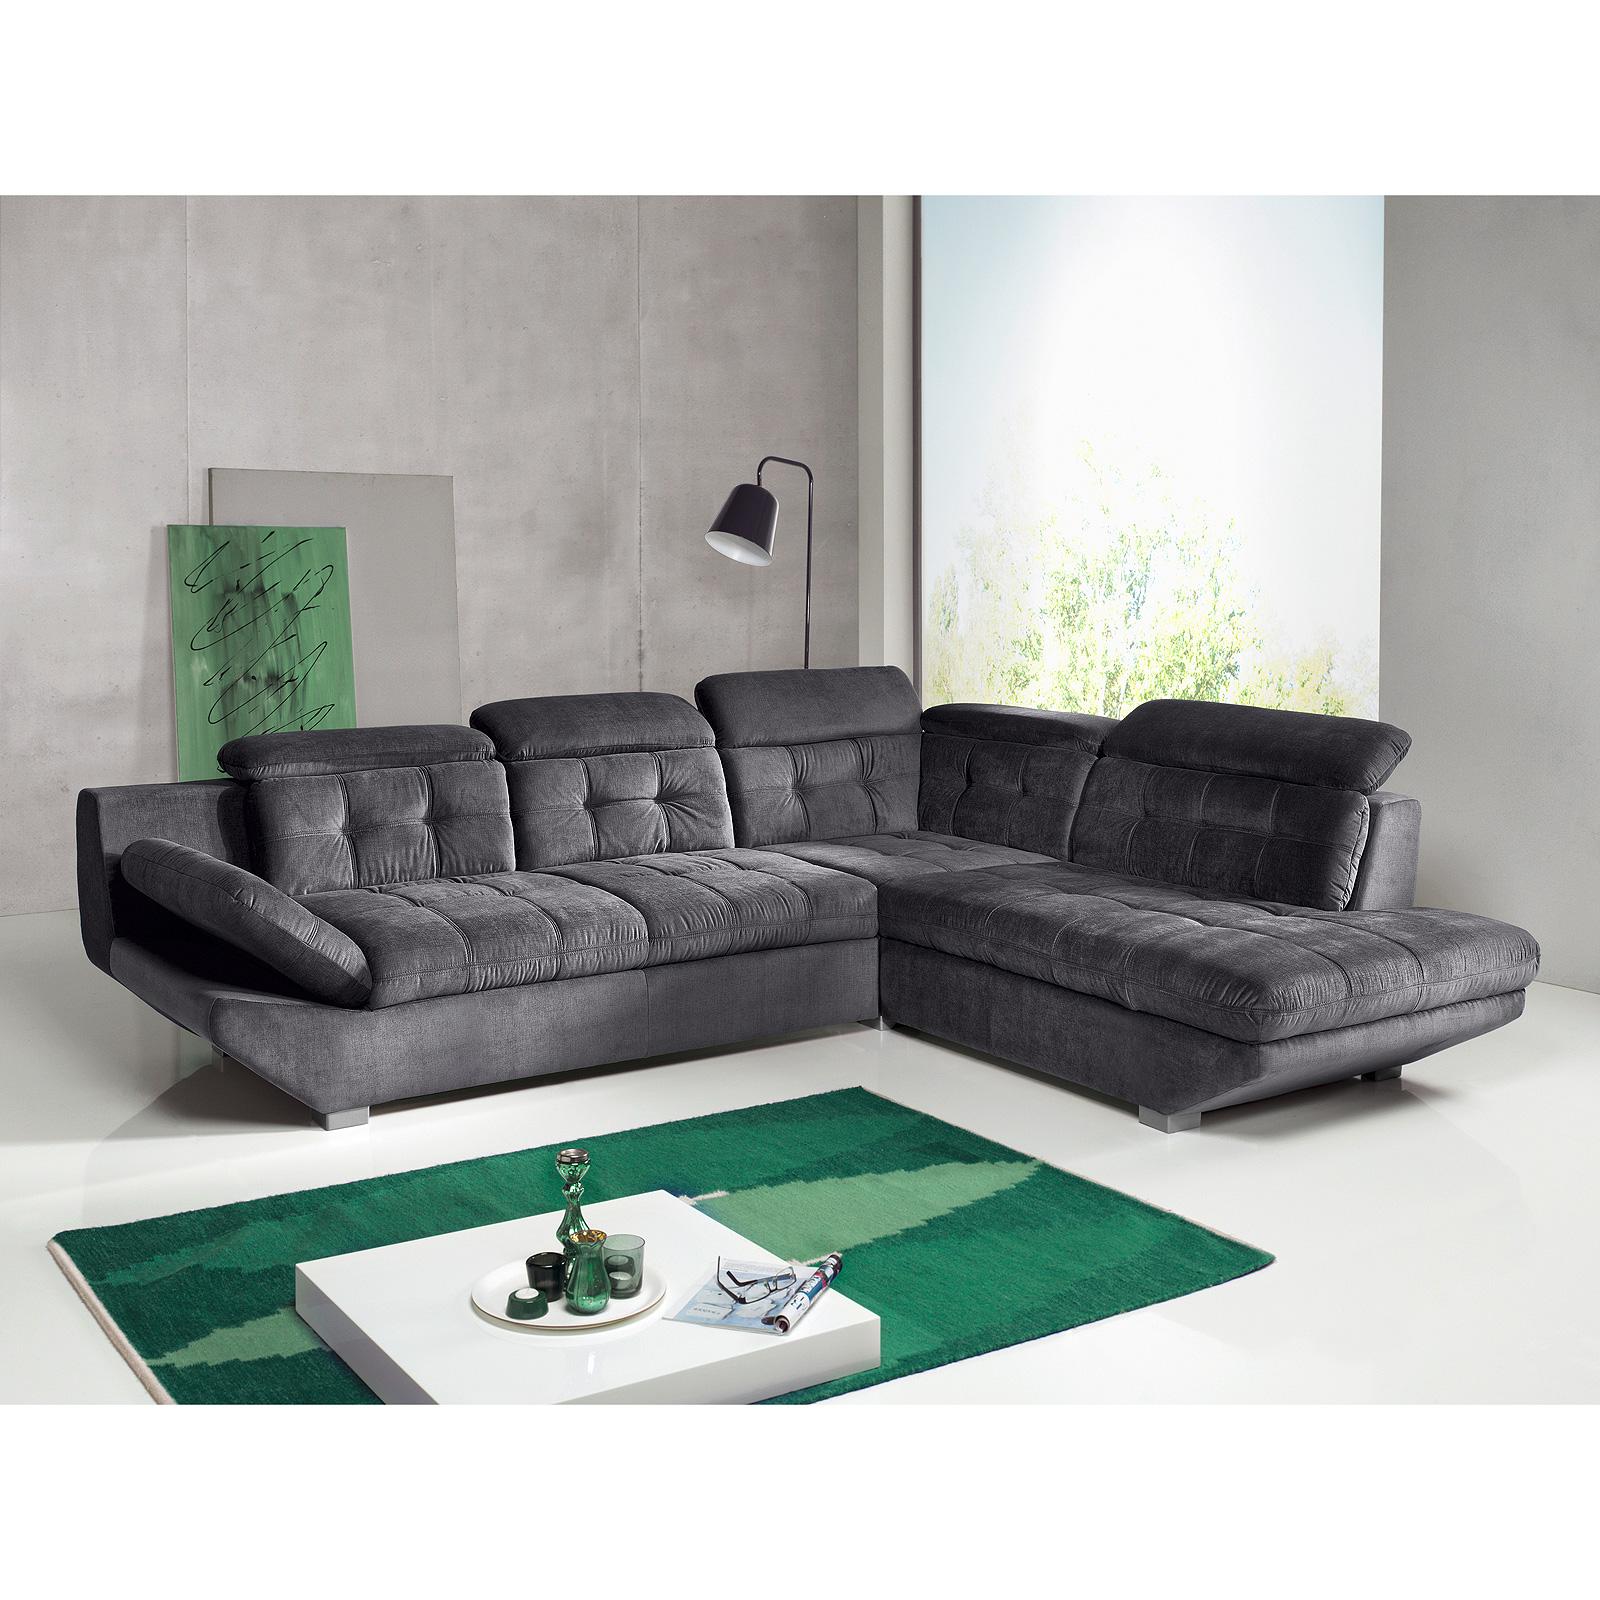 Ecksofa eternity sofa wohnlandschaft polsterecke in for Ecksofa eternity